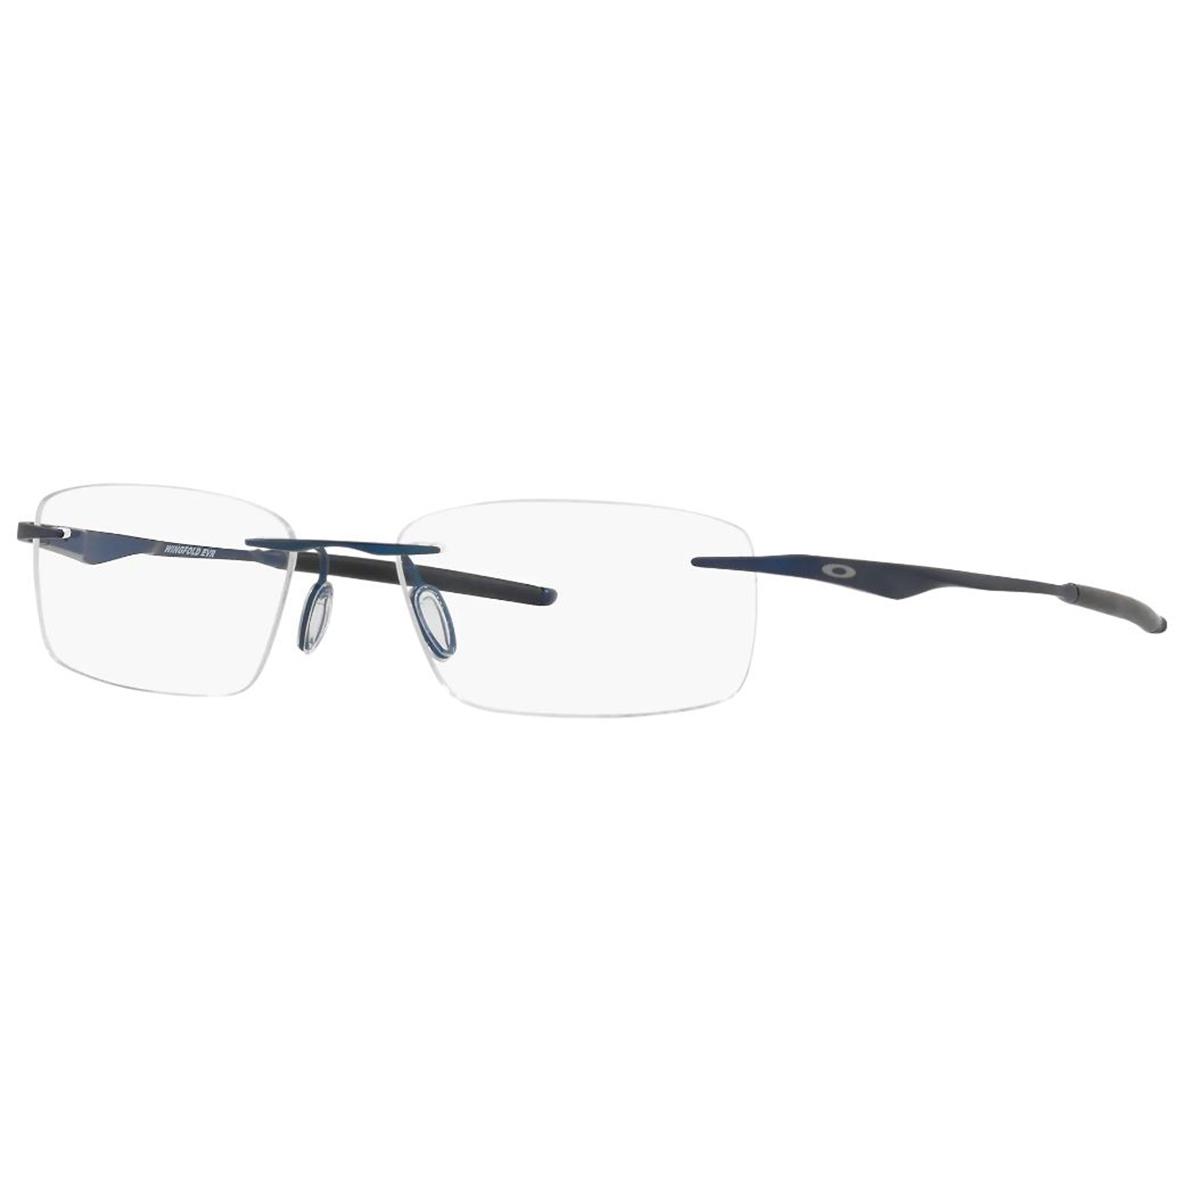 Óculos de Grau Titanium Oakley OX5118 Wingfold Evr Azul Marinho